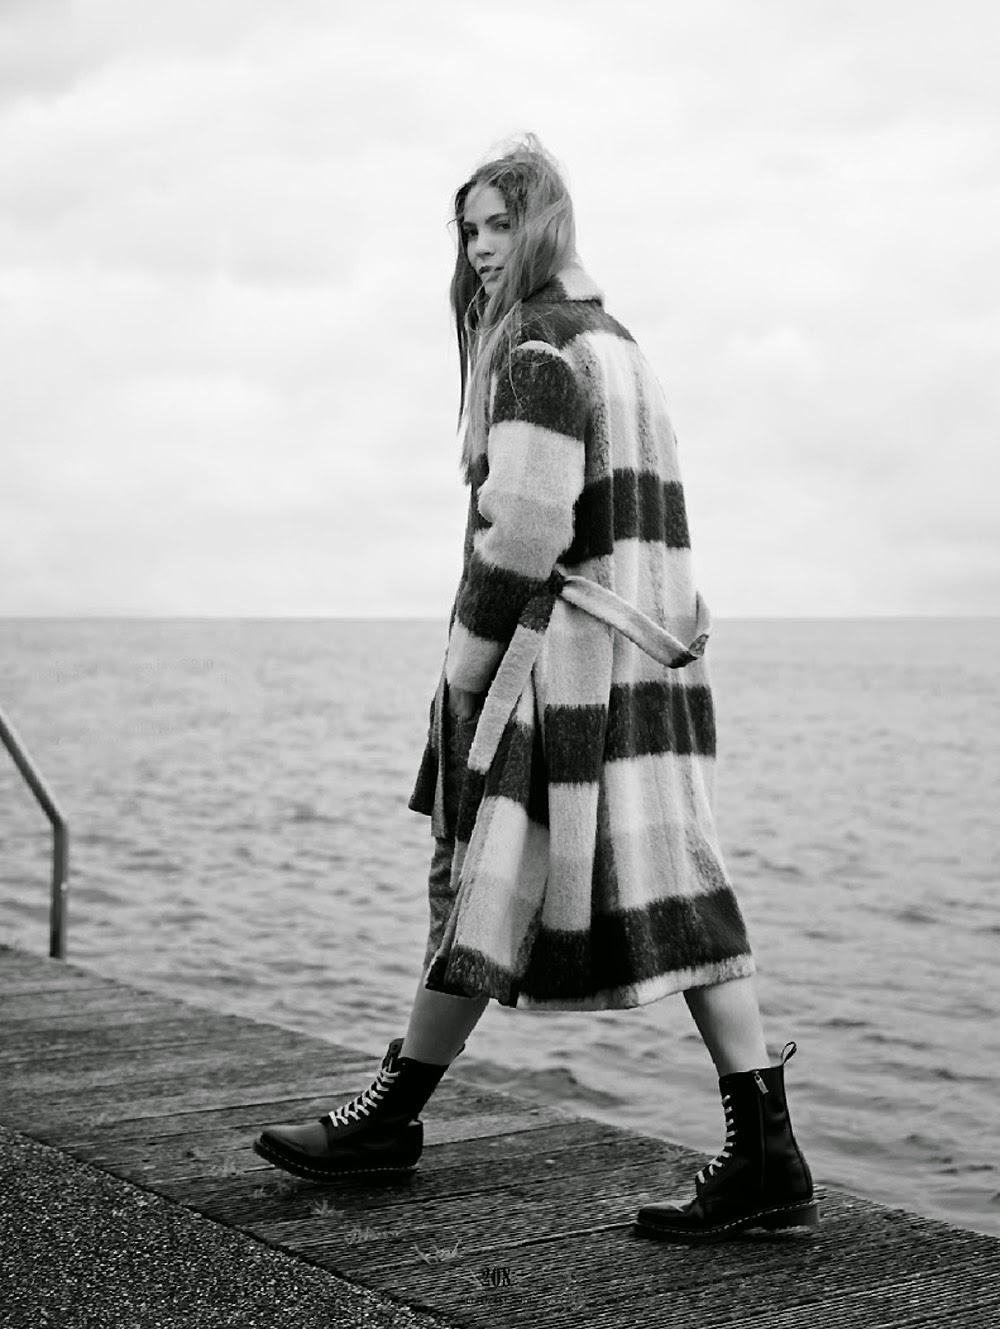 Inga-Marie-Tekukwitha-by-Barrie-Hullegie-Elle-Netherlands-magazine-editorial-Love-rush.1